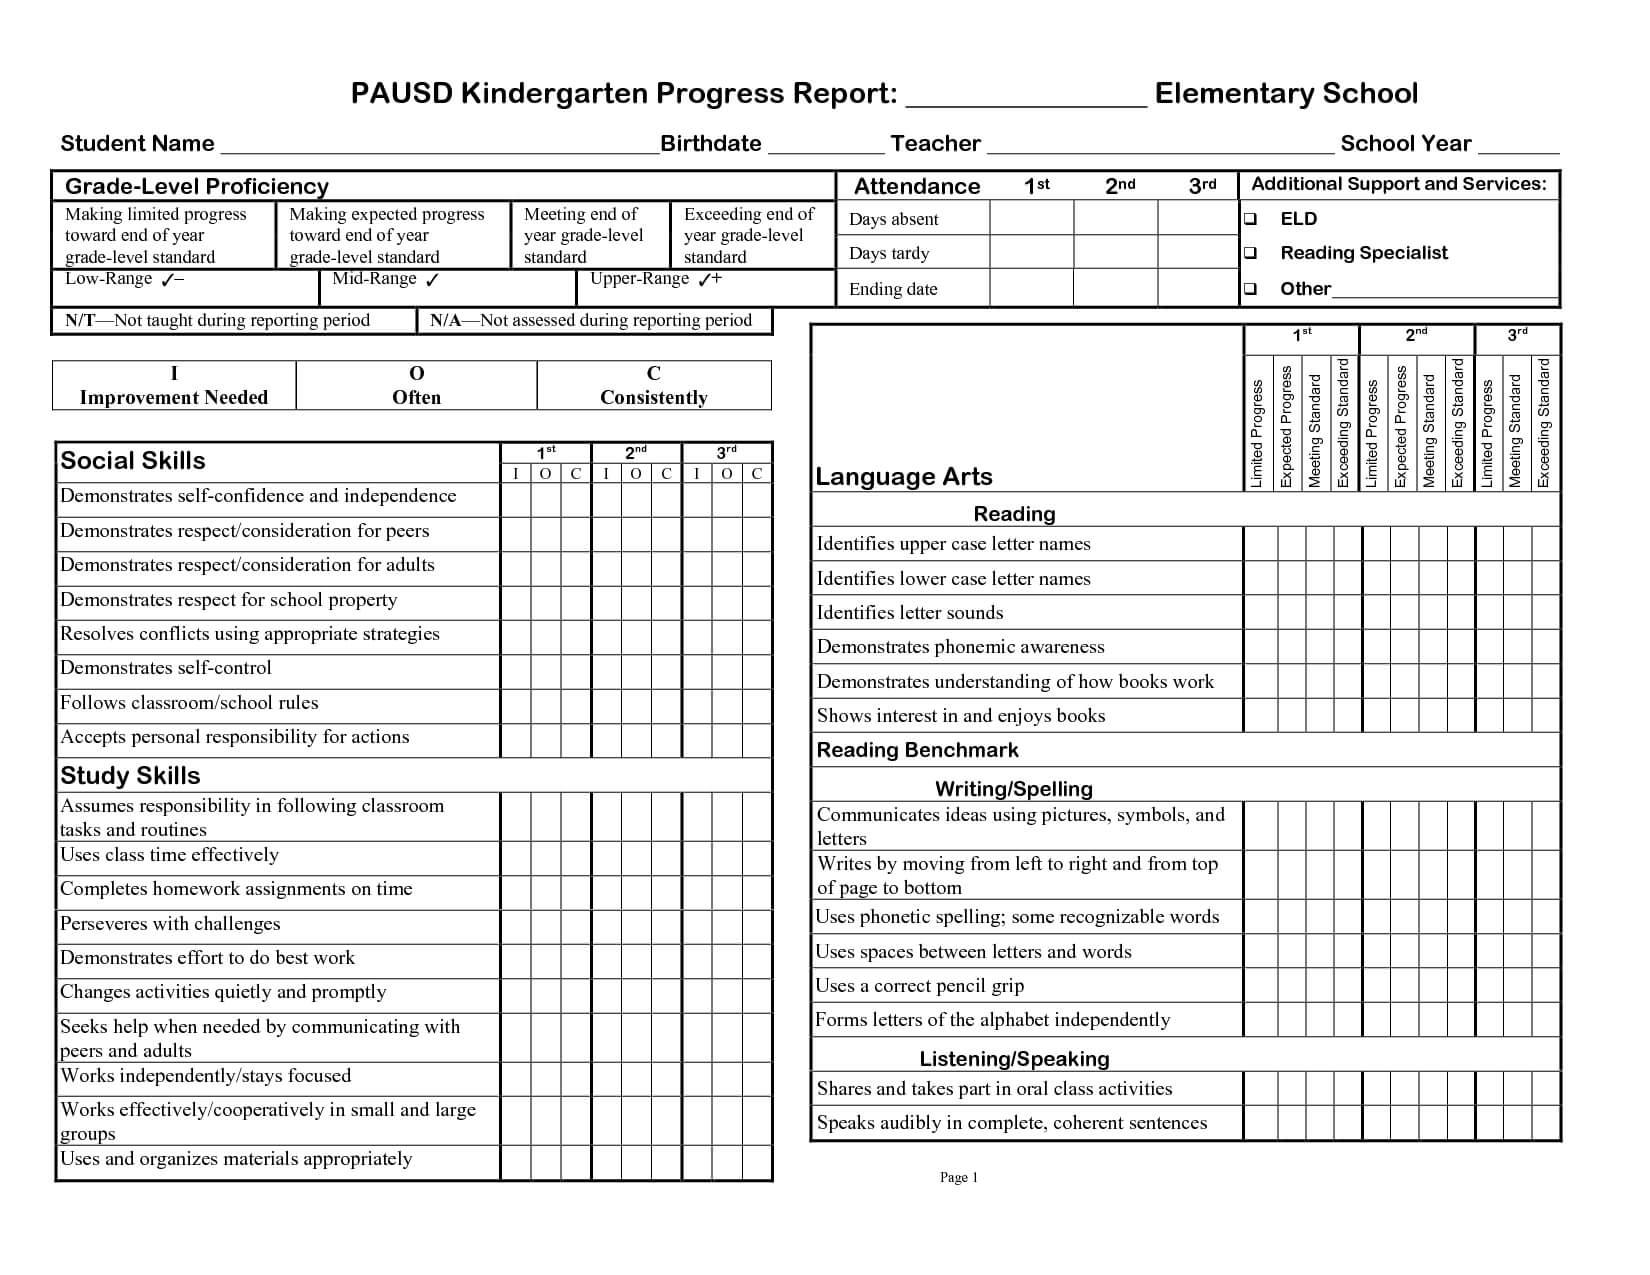 Kindergarten Social Skills Progress Report Blank Templates In School Progress Report Template